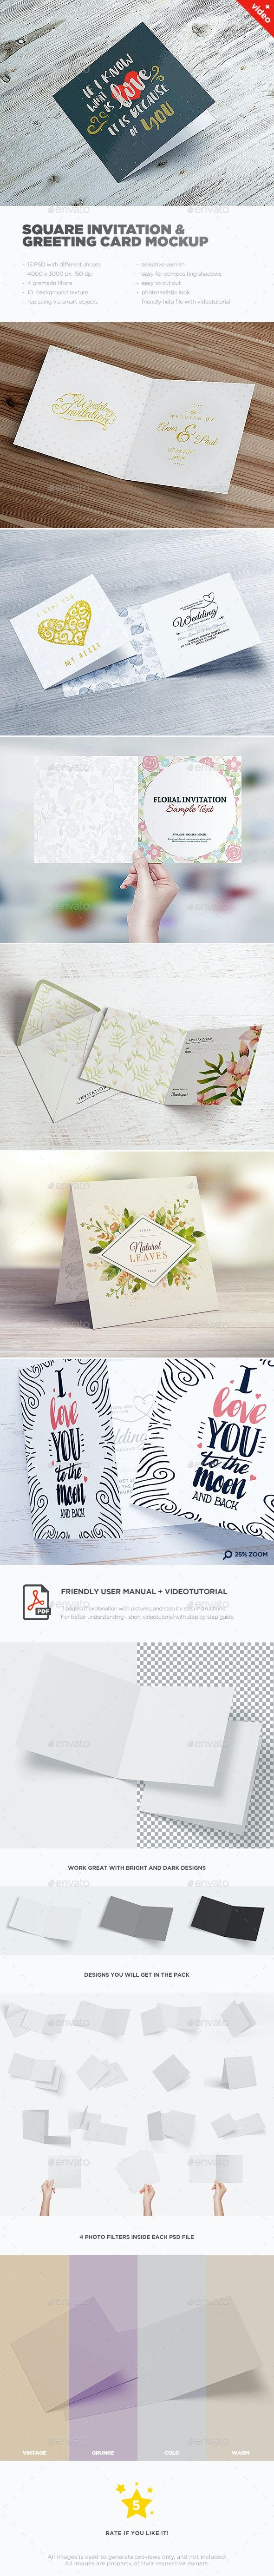 Square Invitation & Greeting Card Mockup - Brochures Print